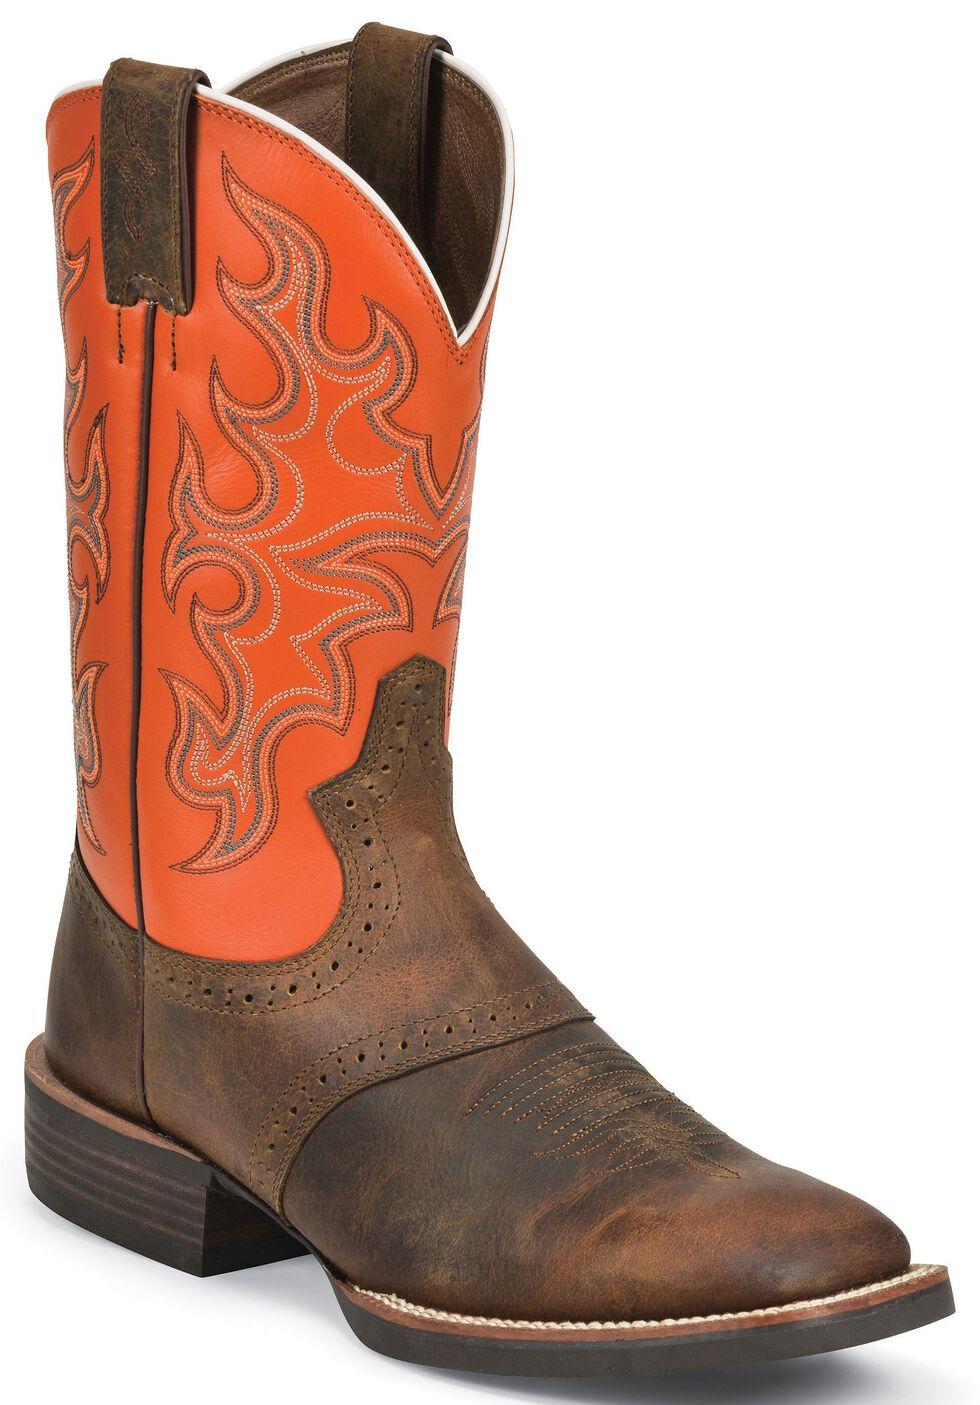 Justin Silver Orange Cattleman Saddle Vamp Cowboy Boots - Wide Square Toe, Tan Distressed, hi-res